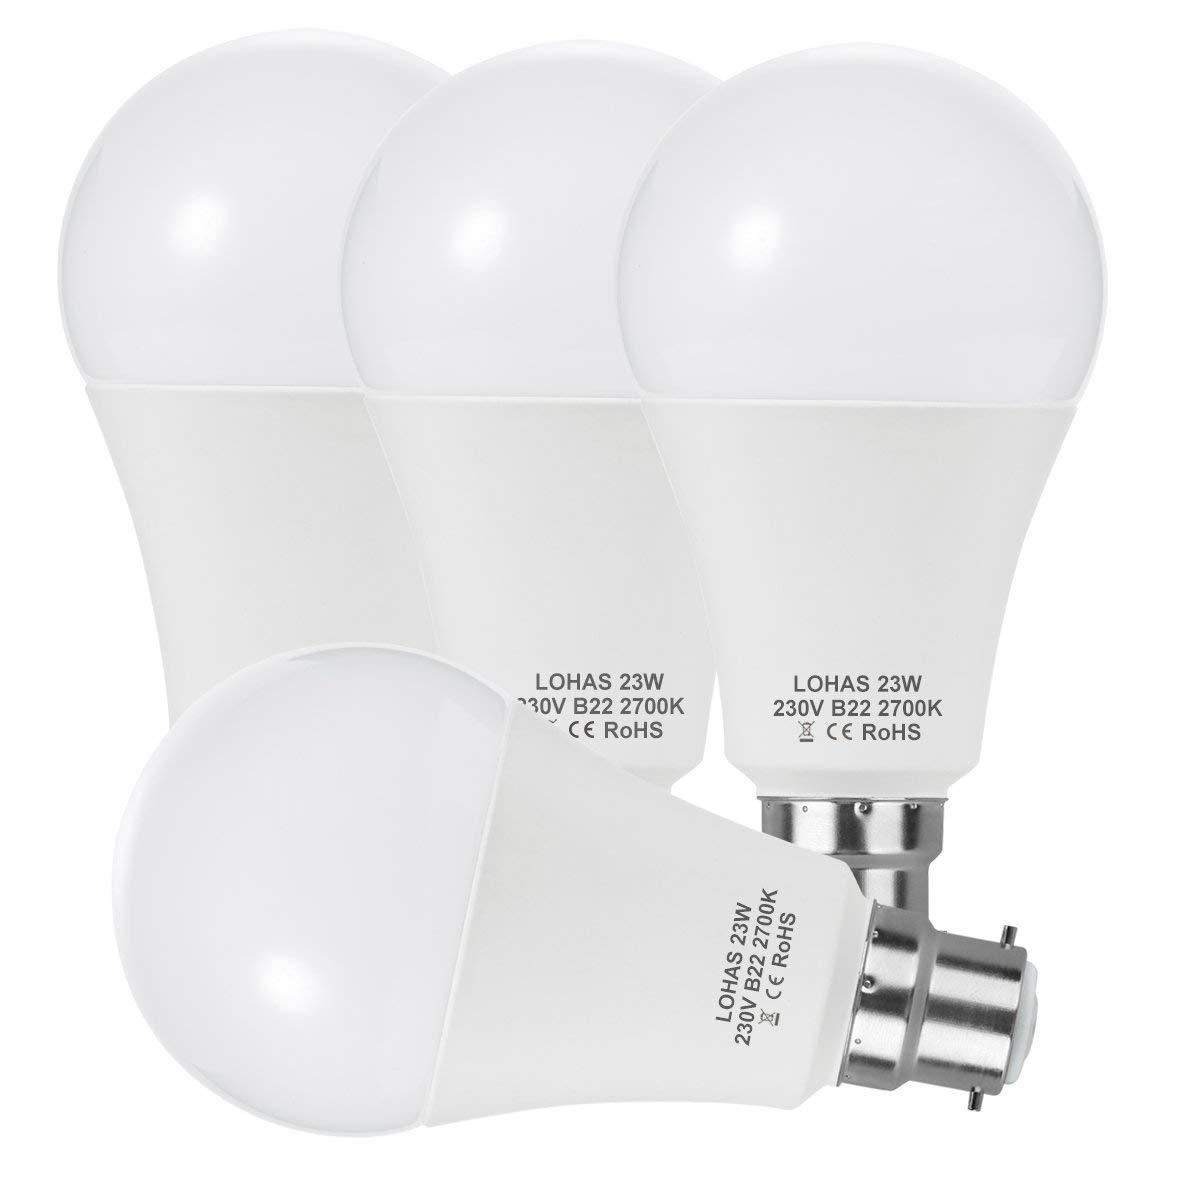 LED A65 B22 Bayonet Bulbs(200W Equivalent)23W LED Lights Warm White 2700K  Super Bright 2500Lm Energy Saving Light Bulbs -4PACK